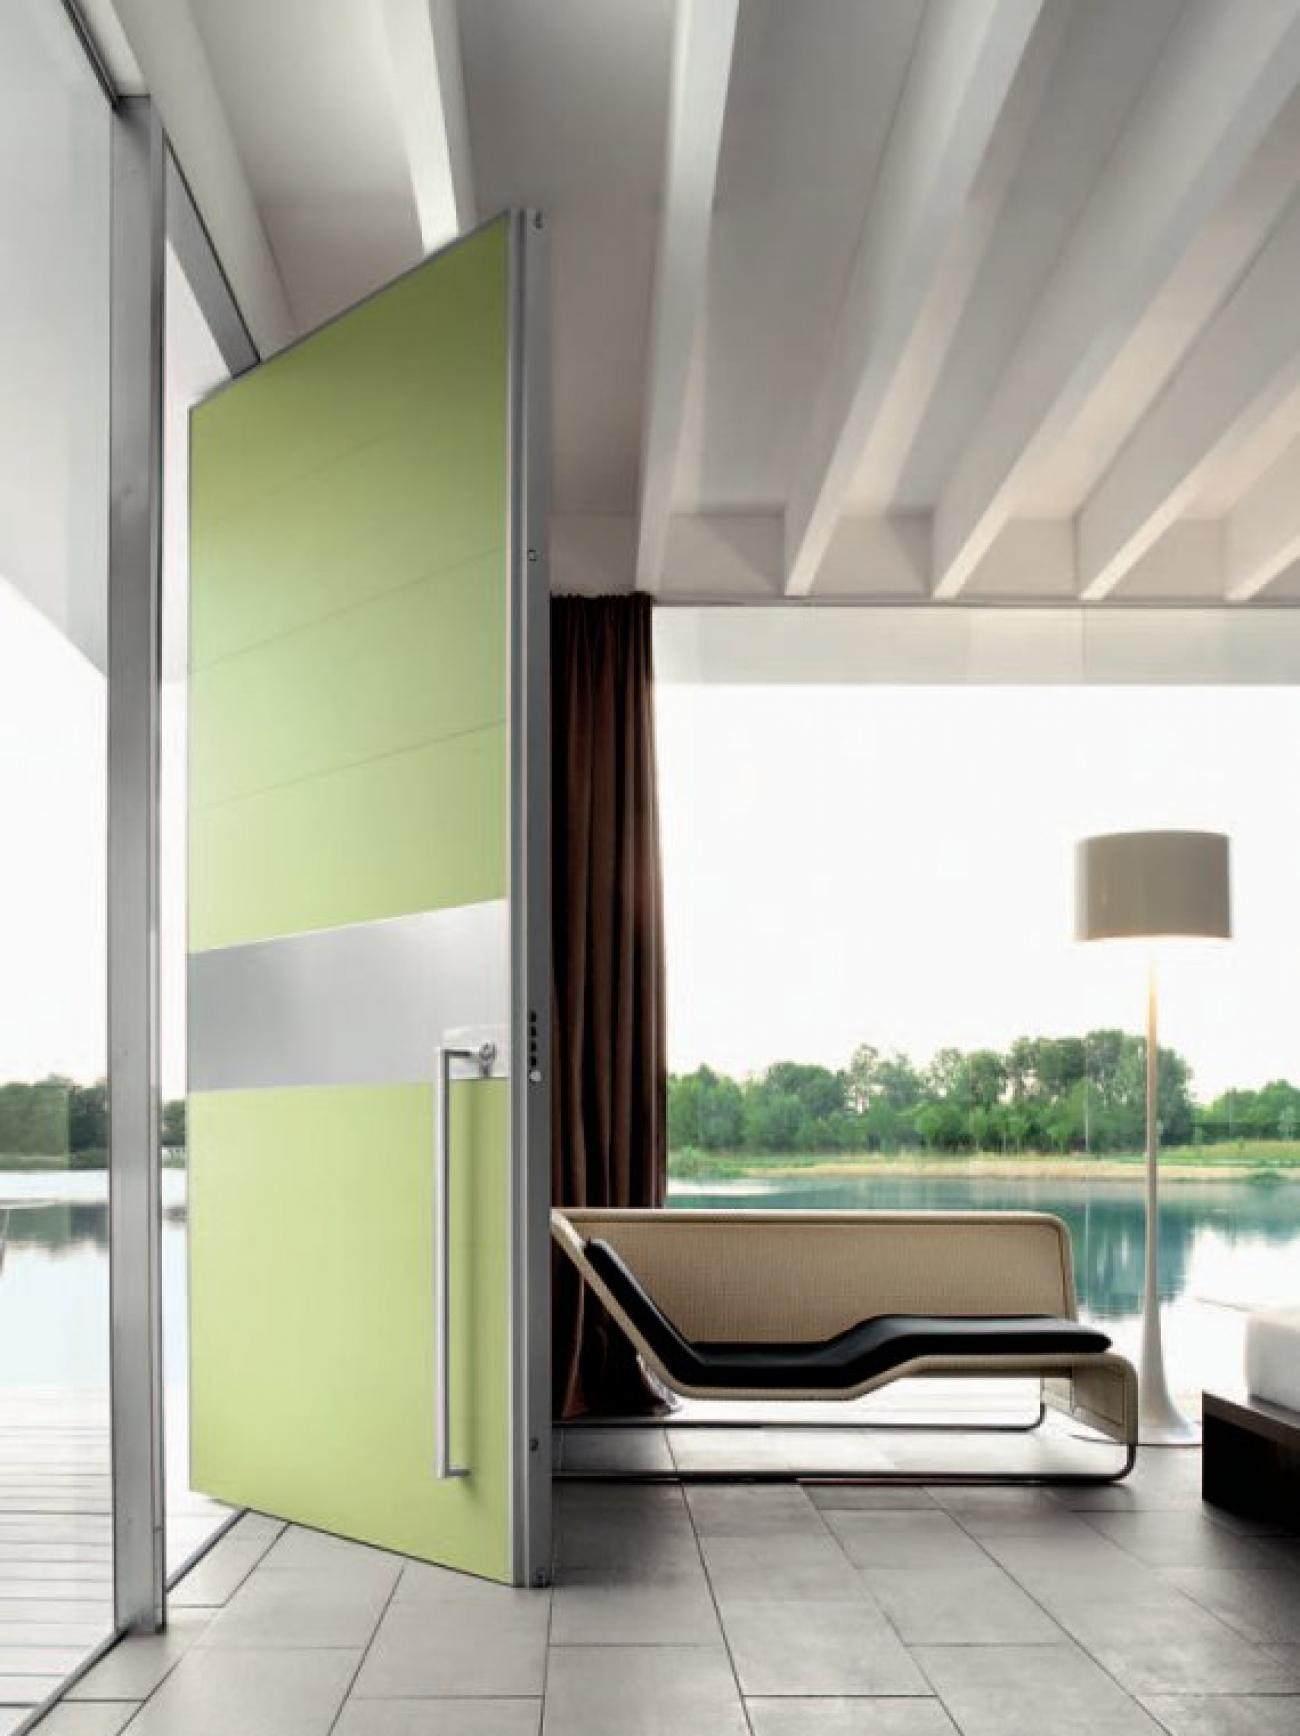 Puertas de dise o timberplan for Puertas italianas interior